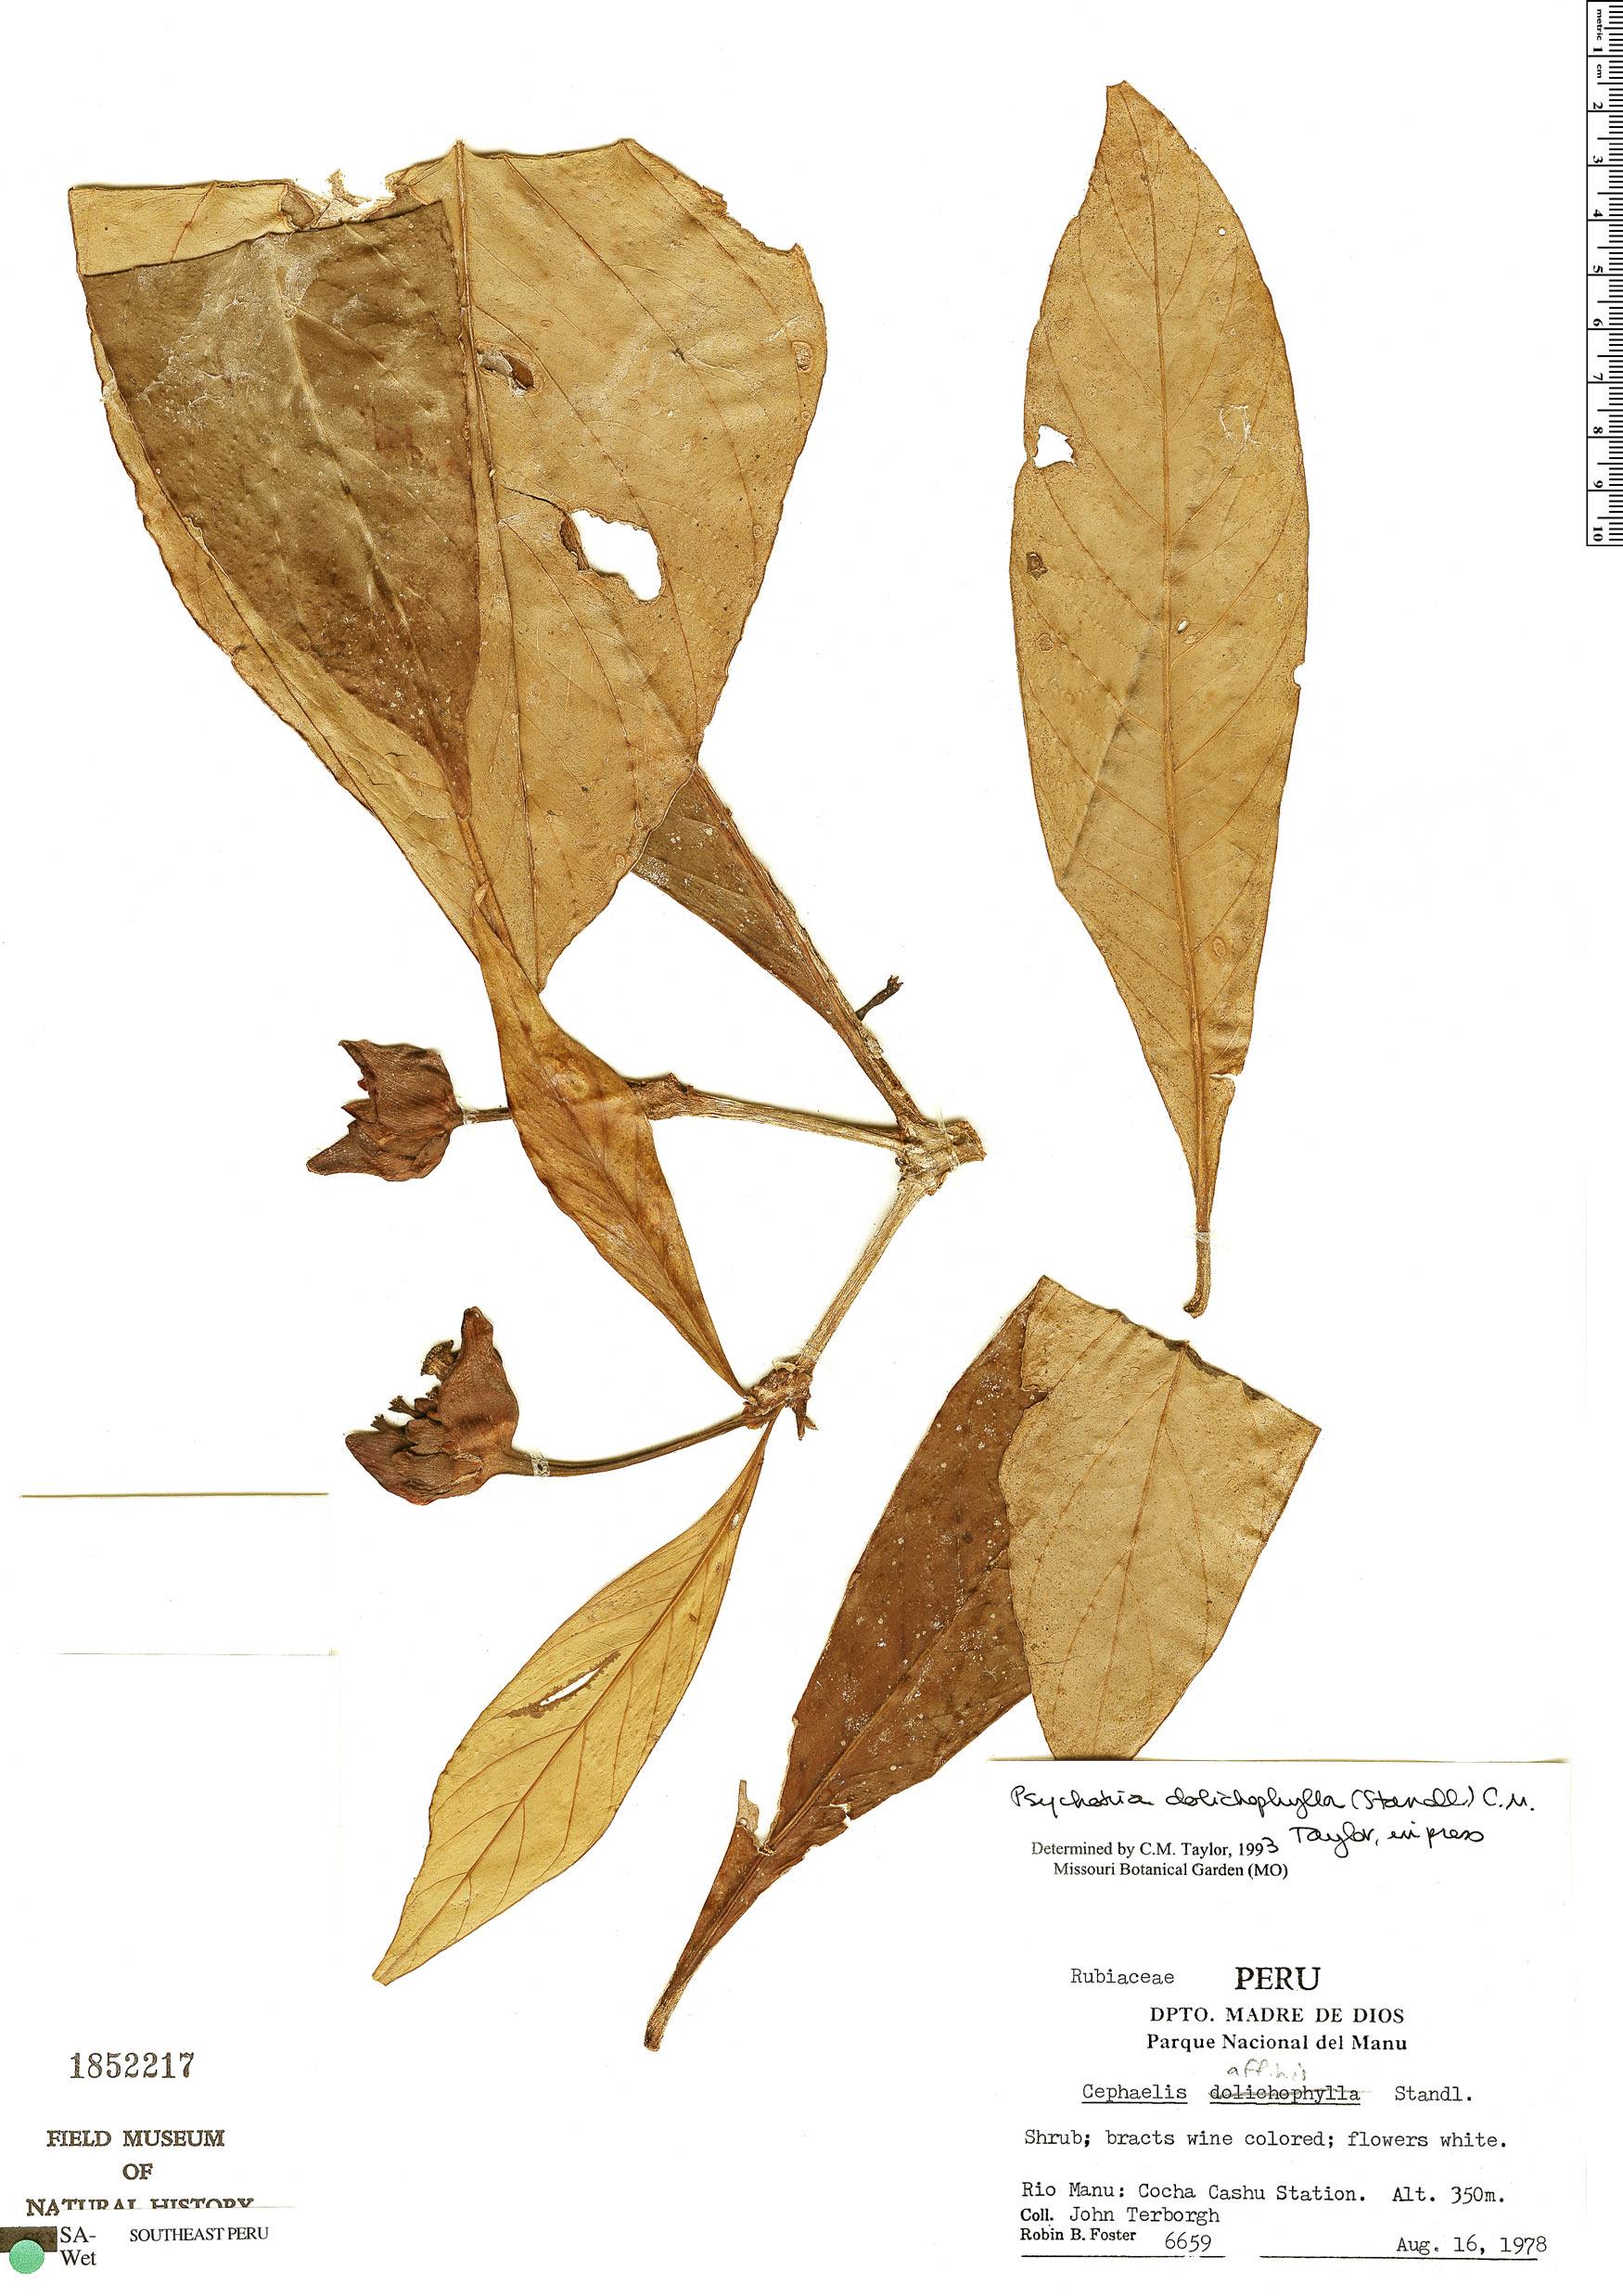 Specimen: Carapichea dolichophylla